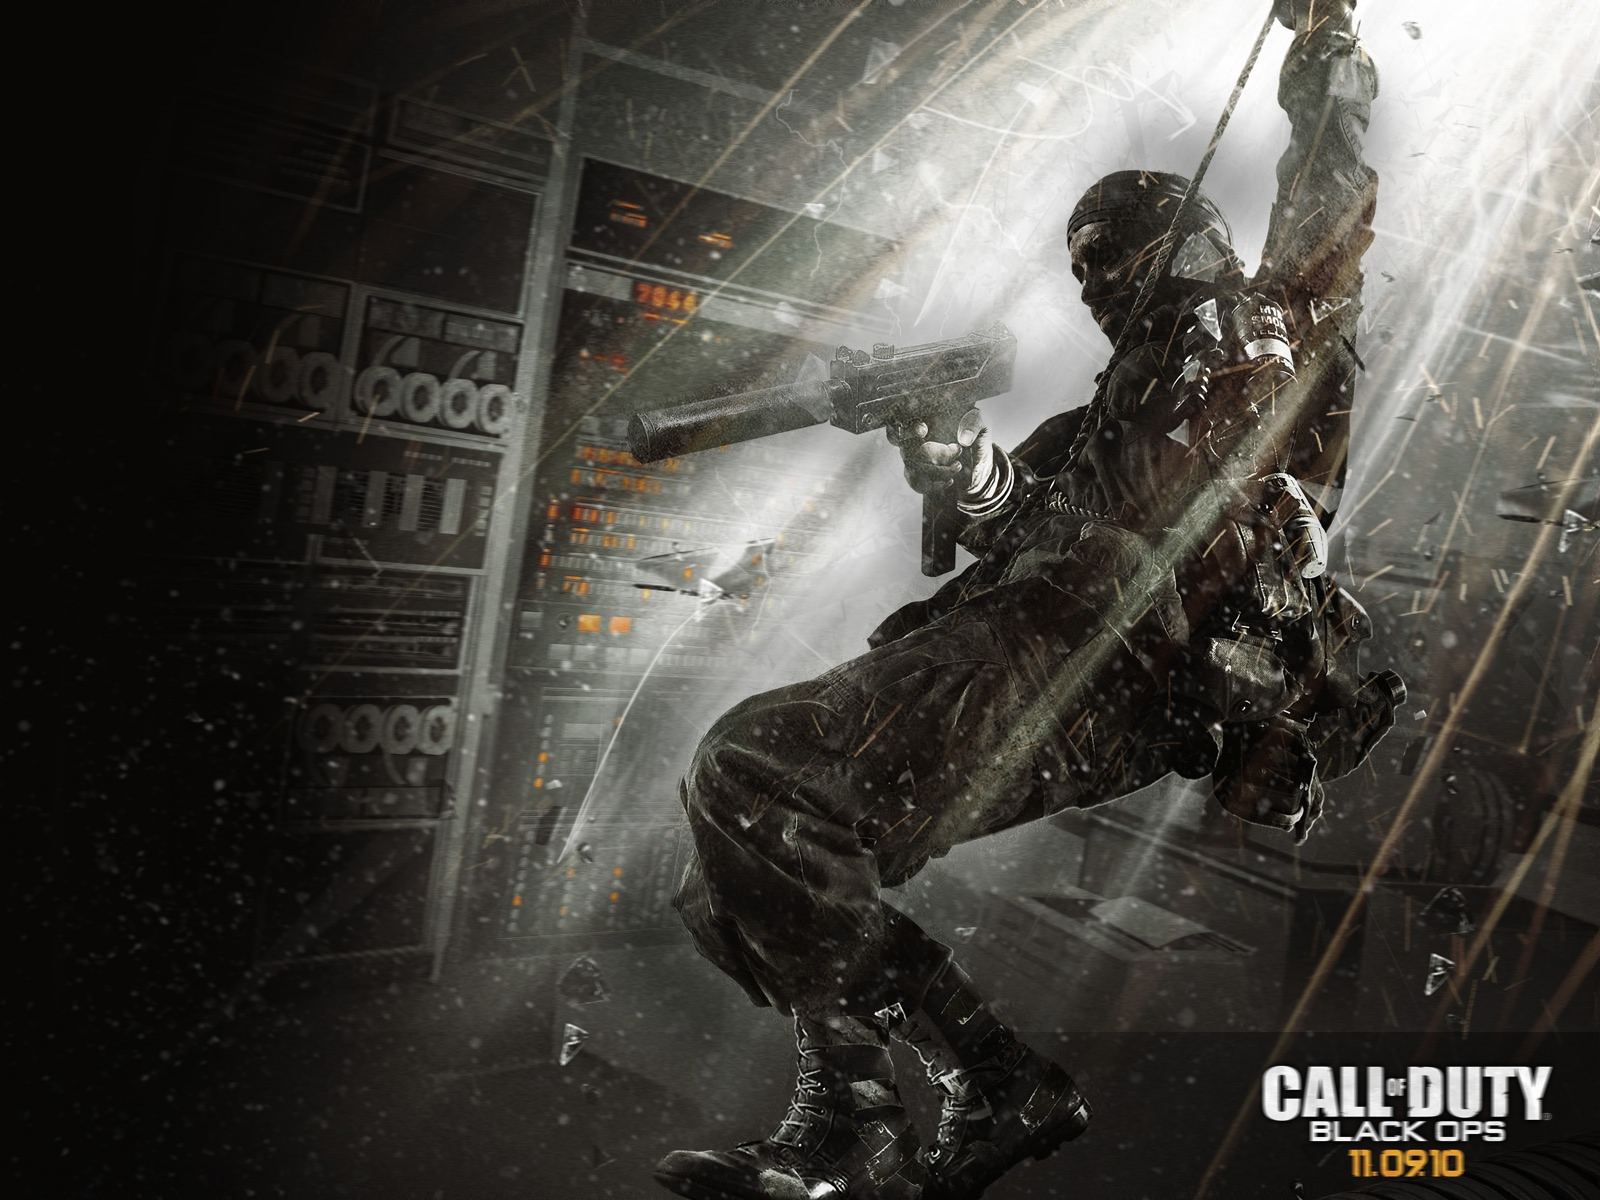 Hd Dock Call Of Duty Black Ops Hd Wallpaper 1080p